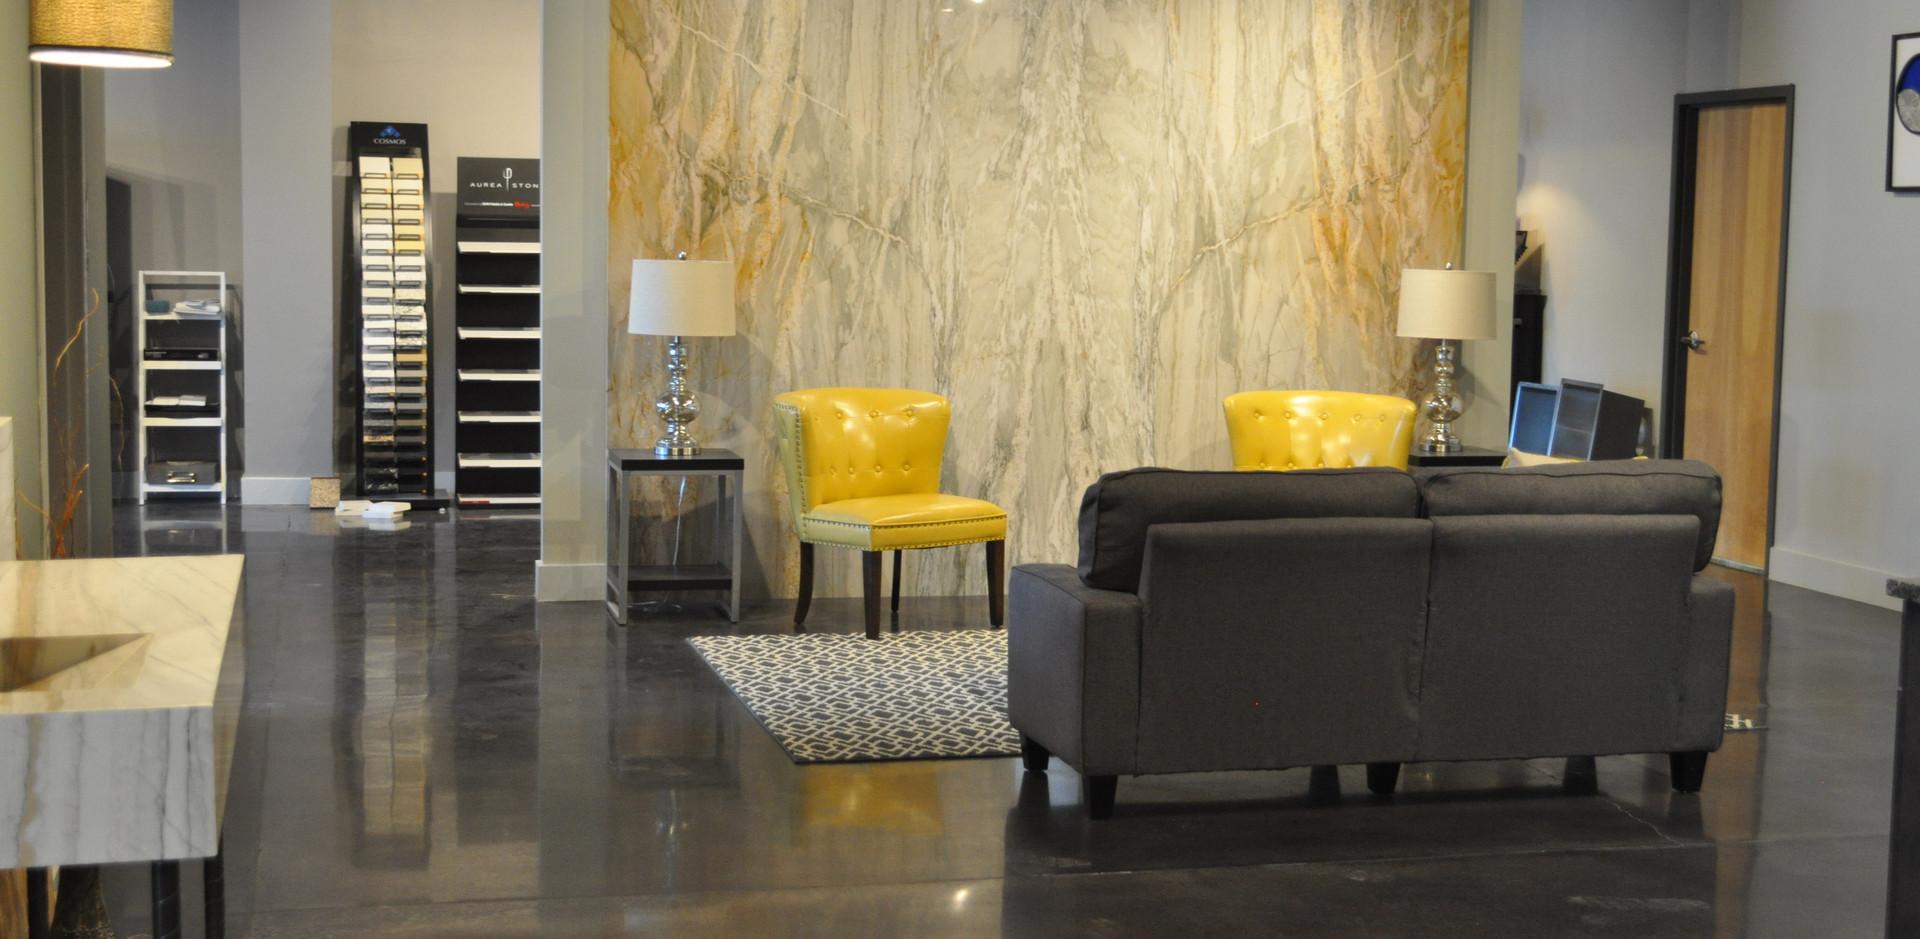 FurnitureLand South, Showroom 12